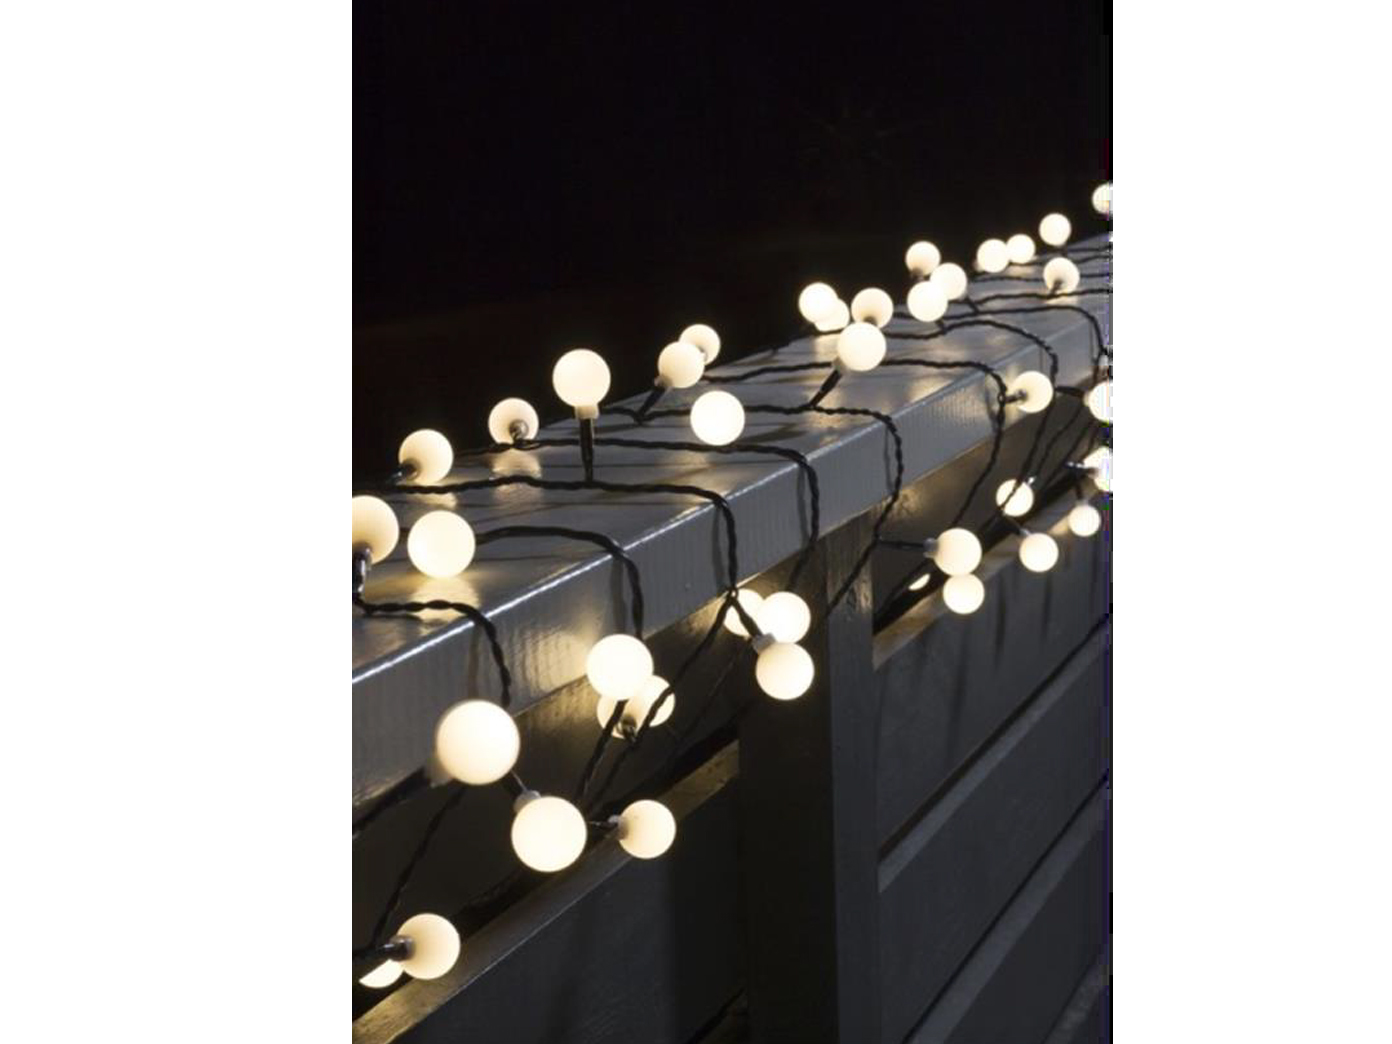 led lichterkette au enbeleuchtung funksteckdose fernbedienung weihnachten ebay. Black Bedroom Furniture Sets. Home Design Ideas